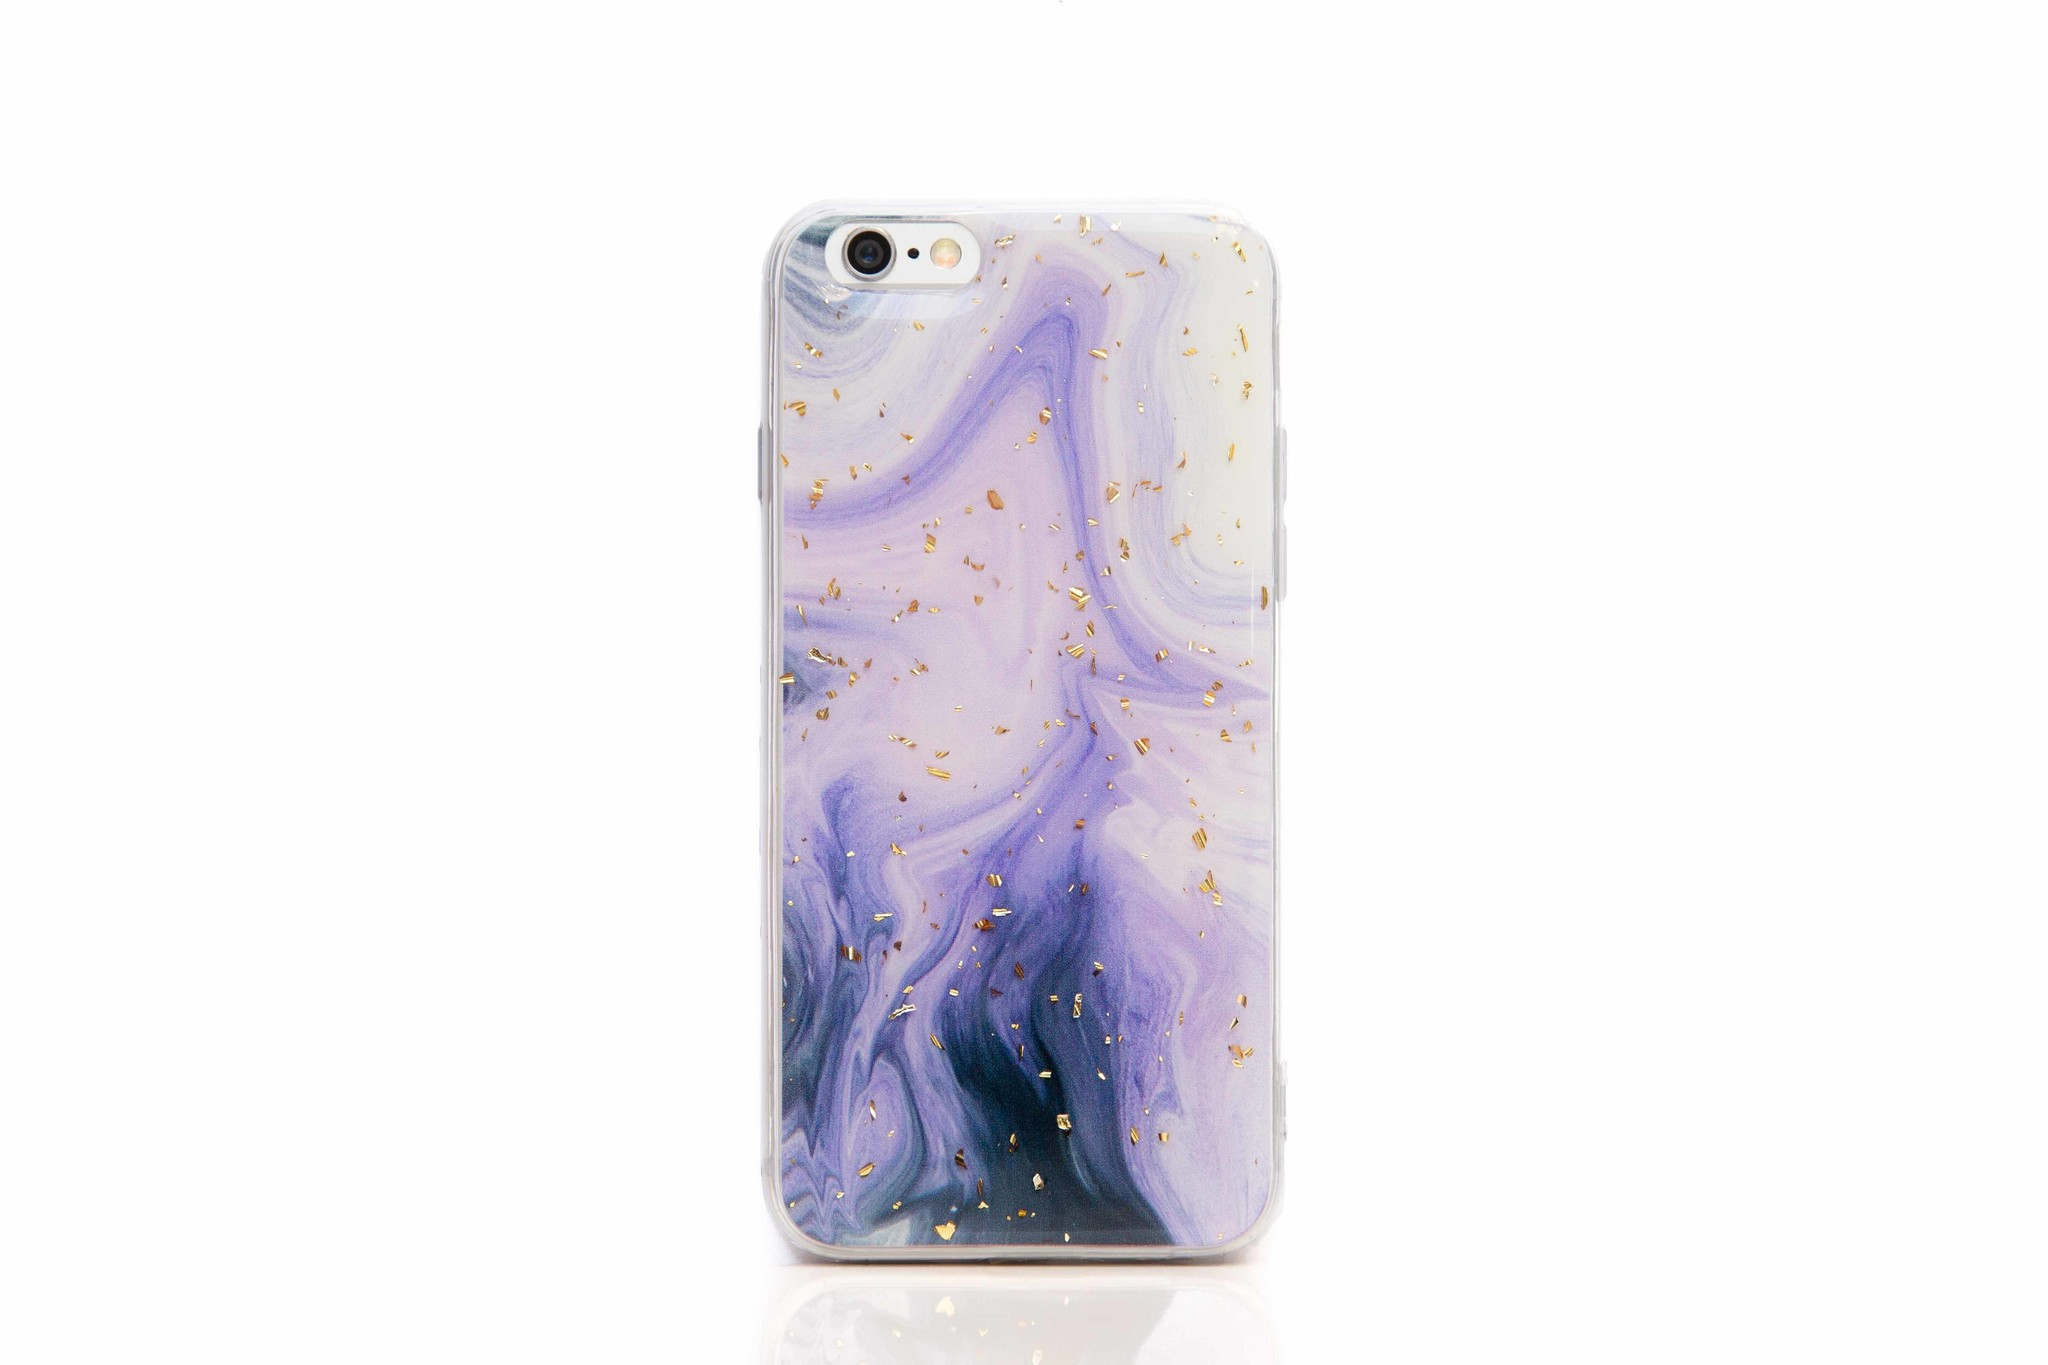 Smartphonehoesje iPhone X / XS | Marmerlook (glitter) | Paars / wit